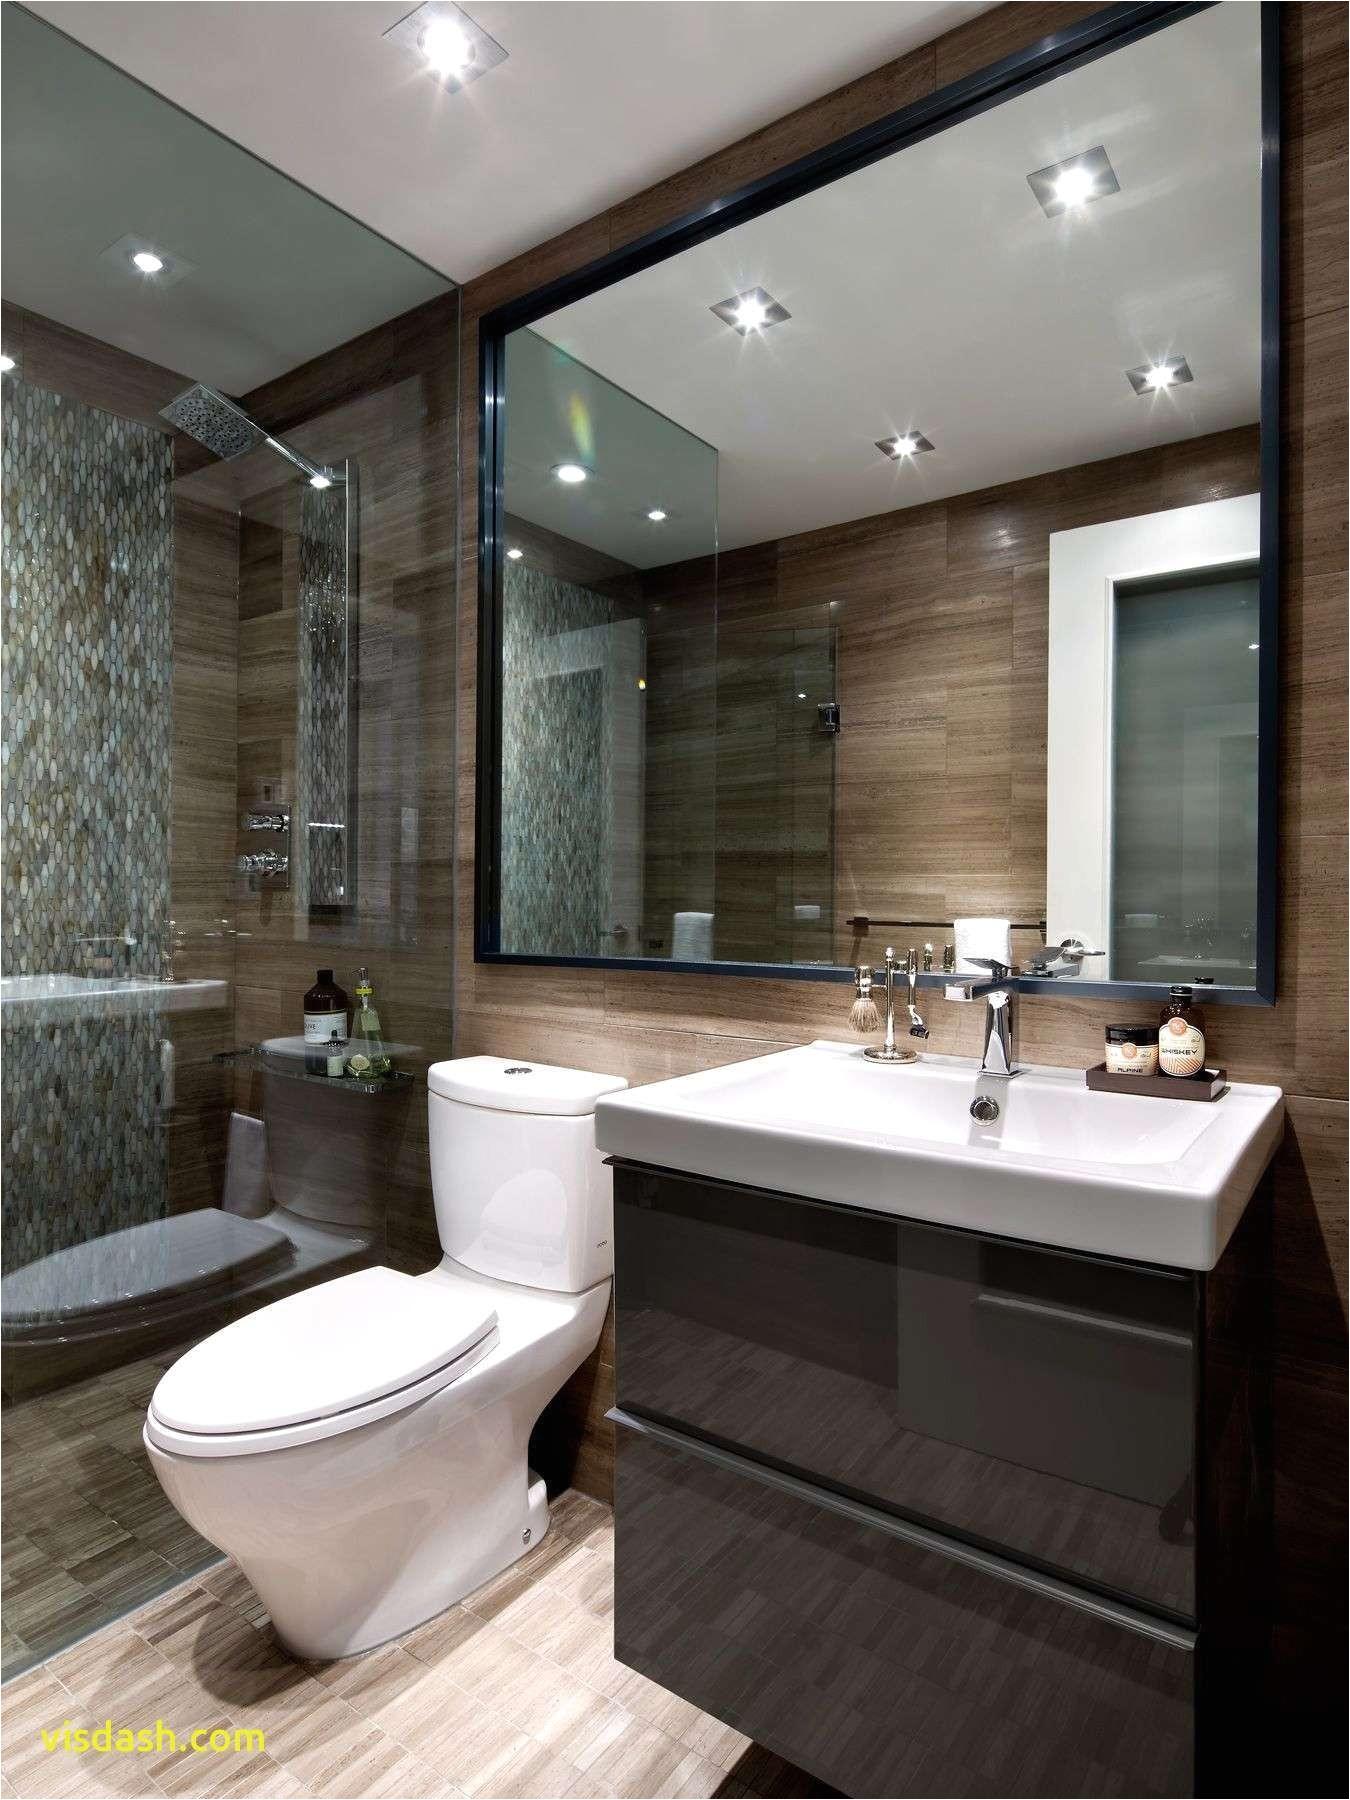 inspiring bathroom decorating ideas beautiful bathroom picture ideas lovely tag toilet ideas 0d